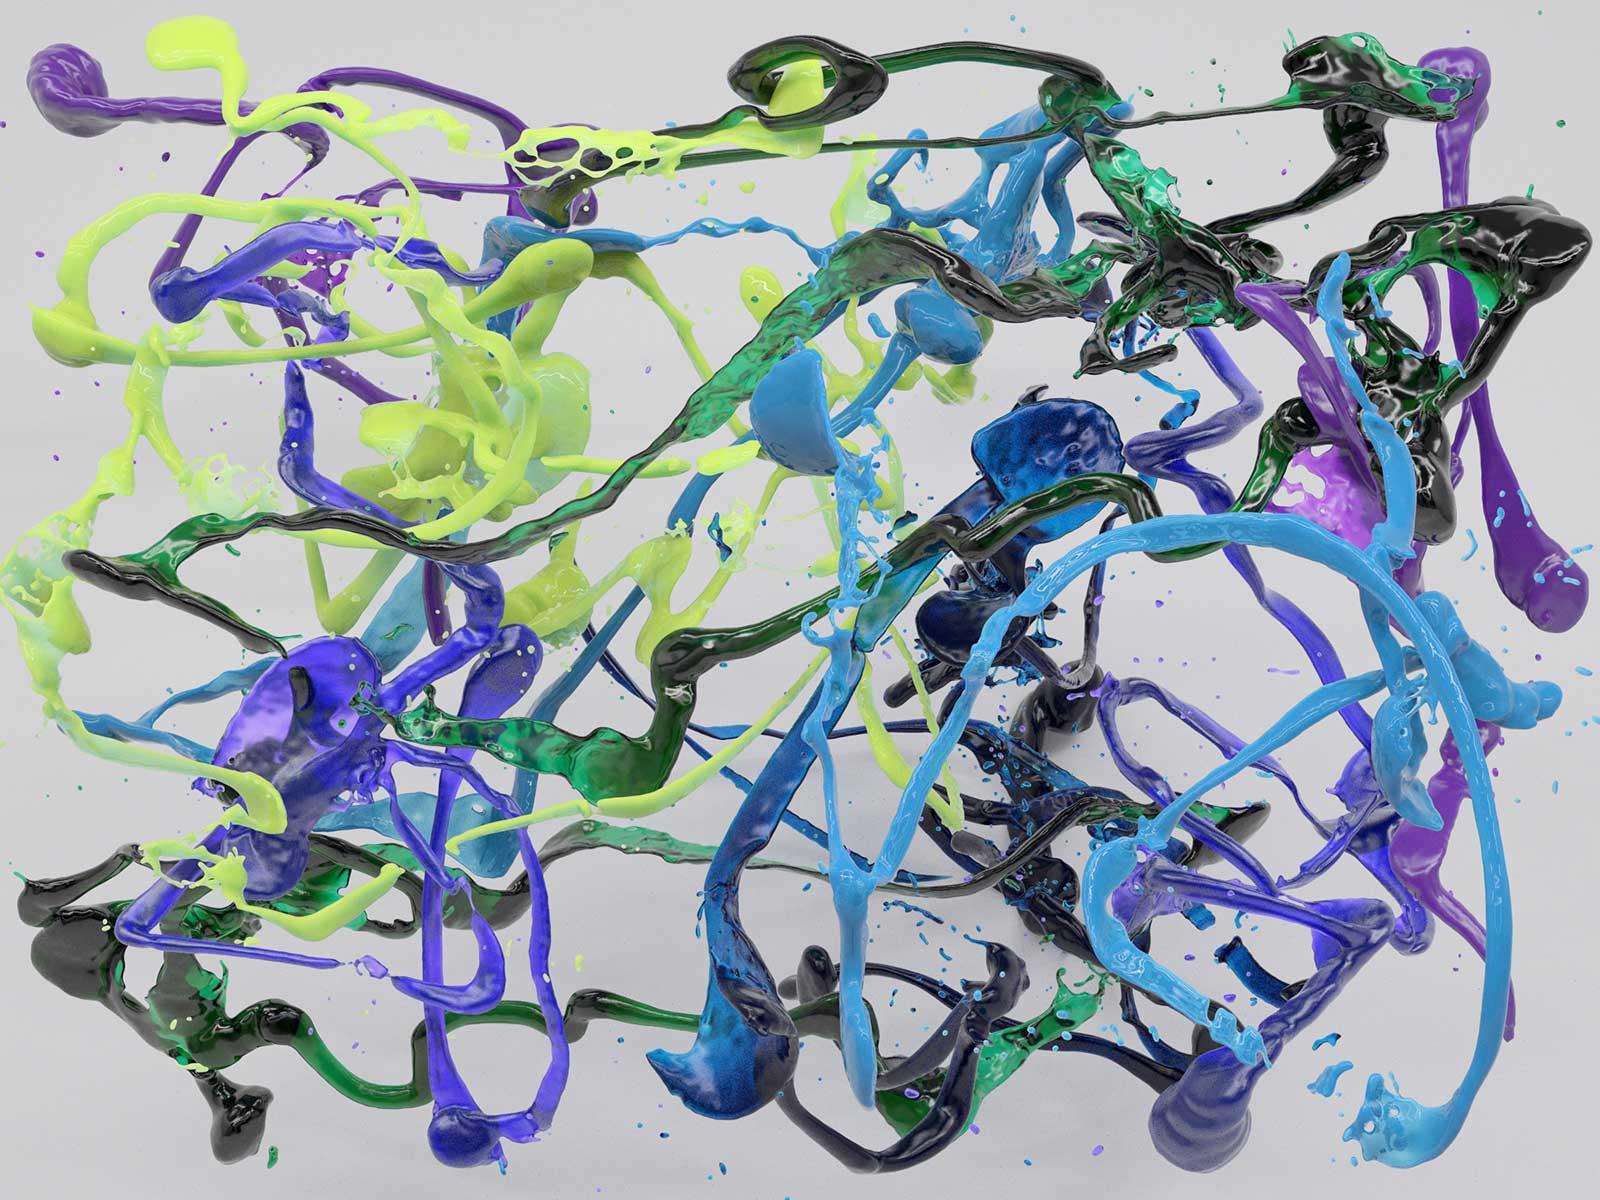 Bodypaint V 09, CGI Fine Art Print, 150 x 200 cm, 2019